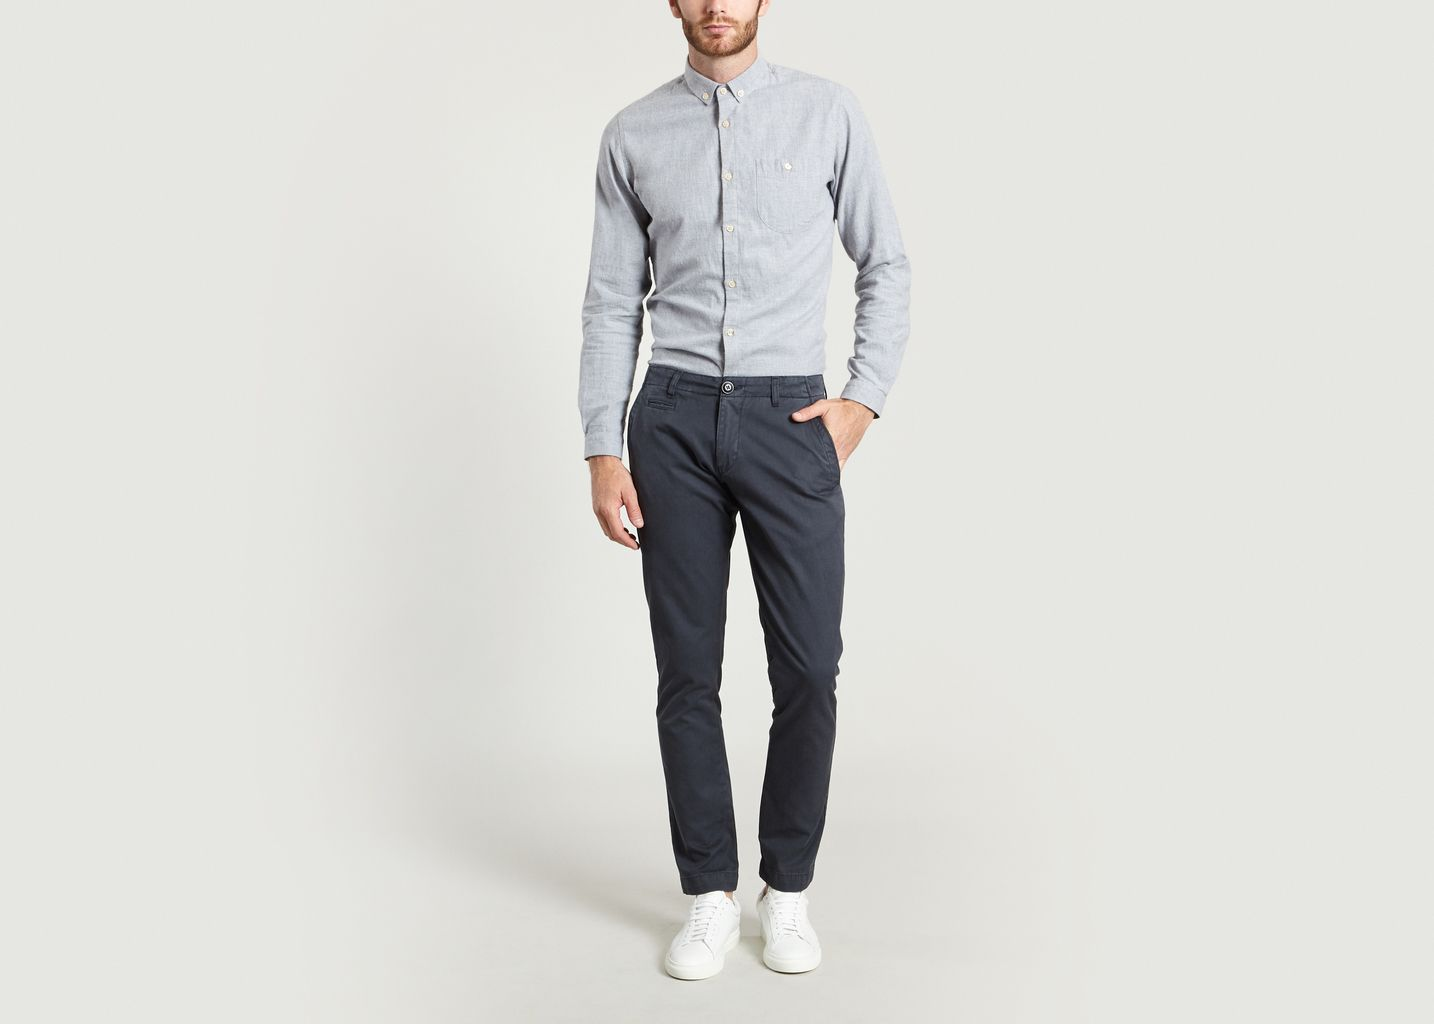 Pantalon Chino - KCA